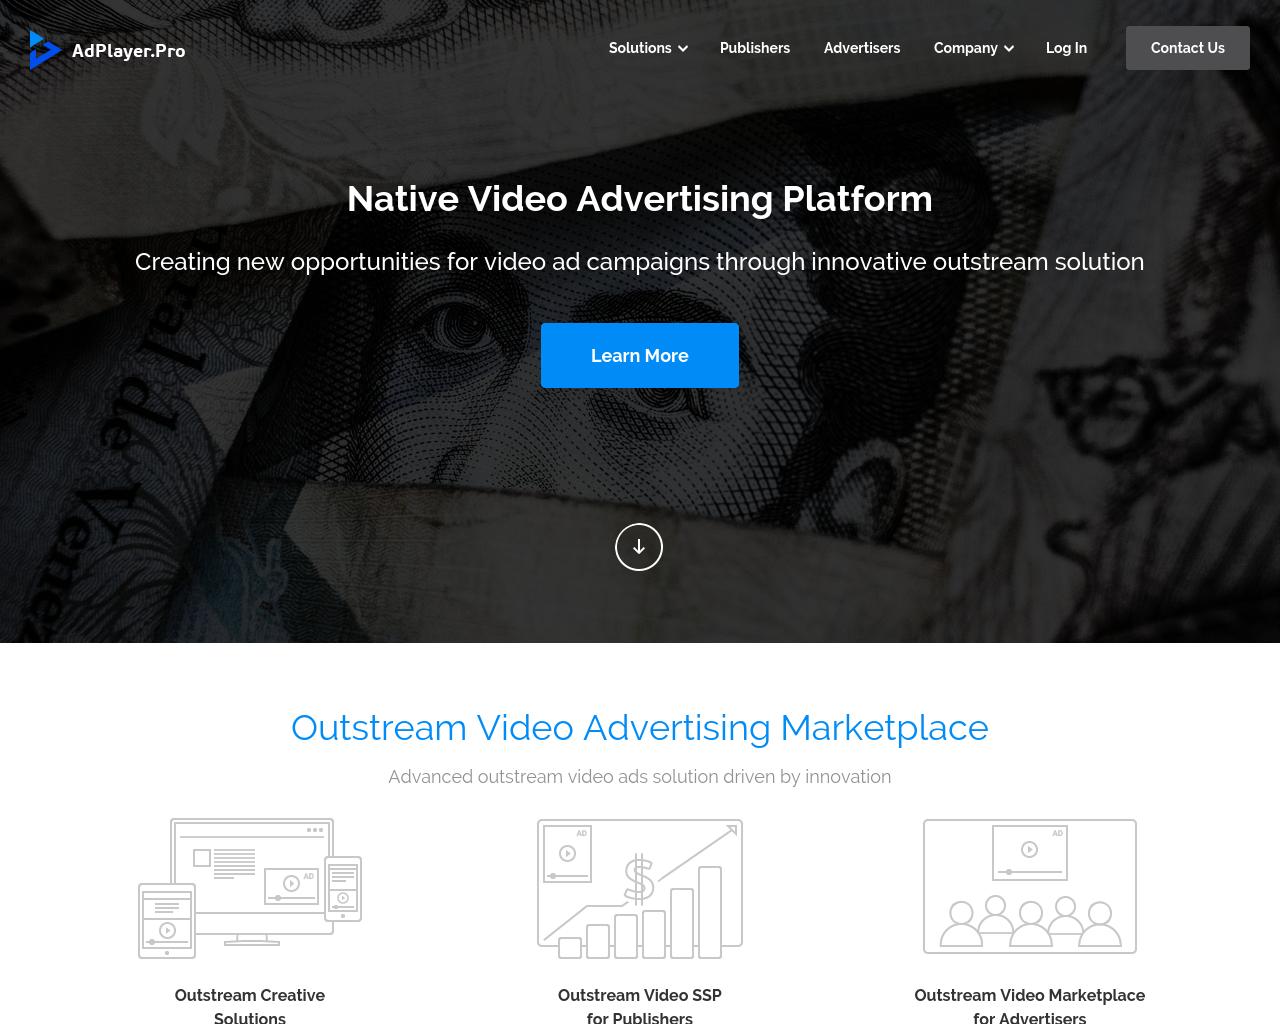 AdPlayer.Pro-Advertising-Reviews-Pricing